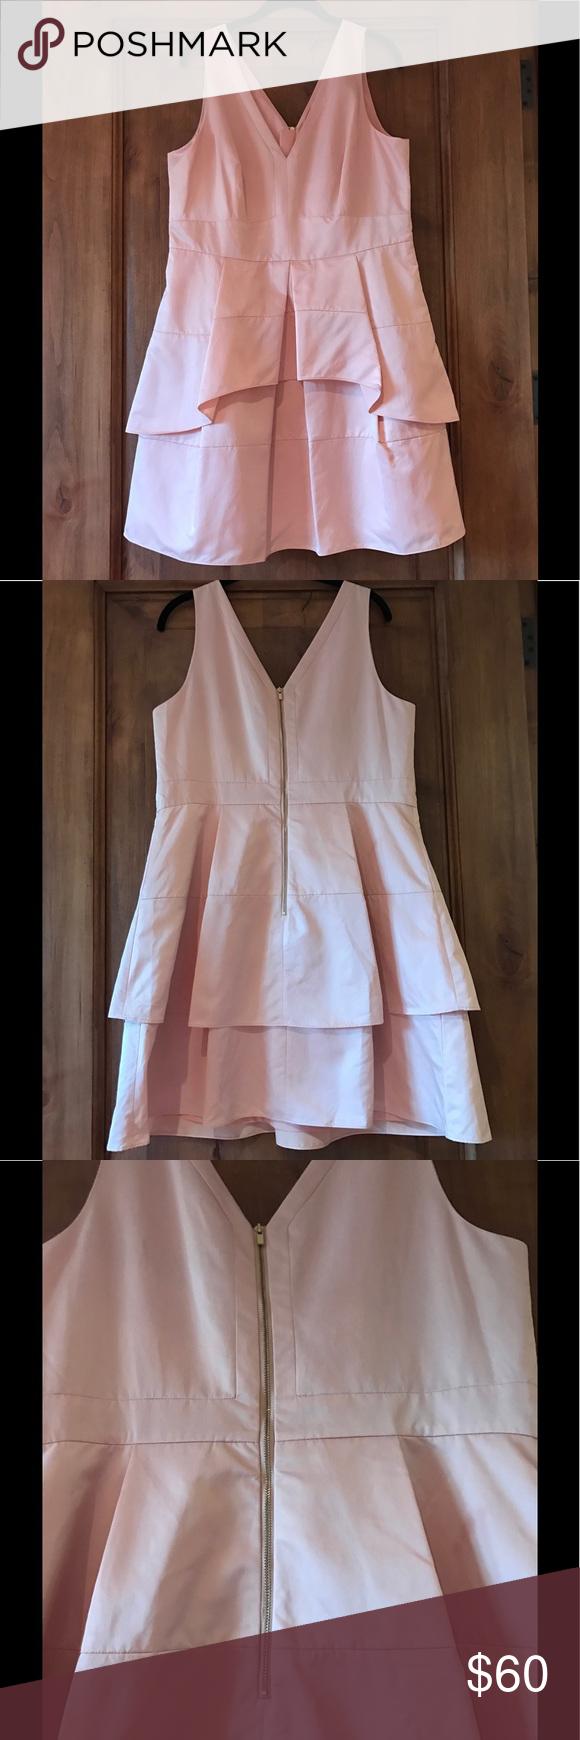 Banana Republic Pink Dress (sz. 16) Pink knee length Banana Republic dress. Size 16. Never worn. Banana Republic Dresses